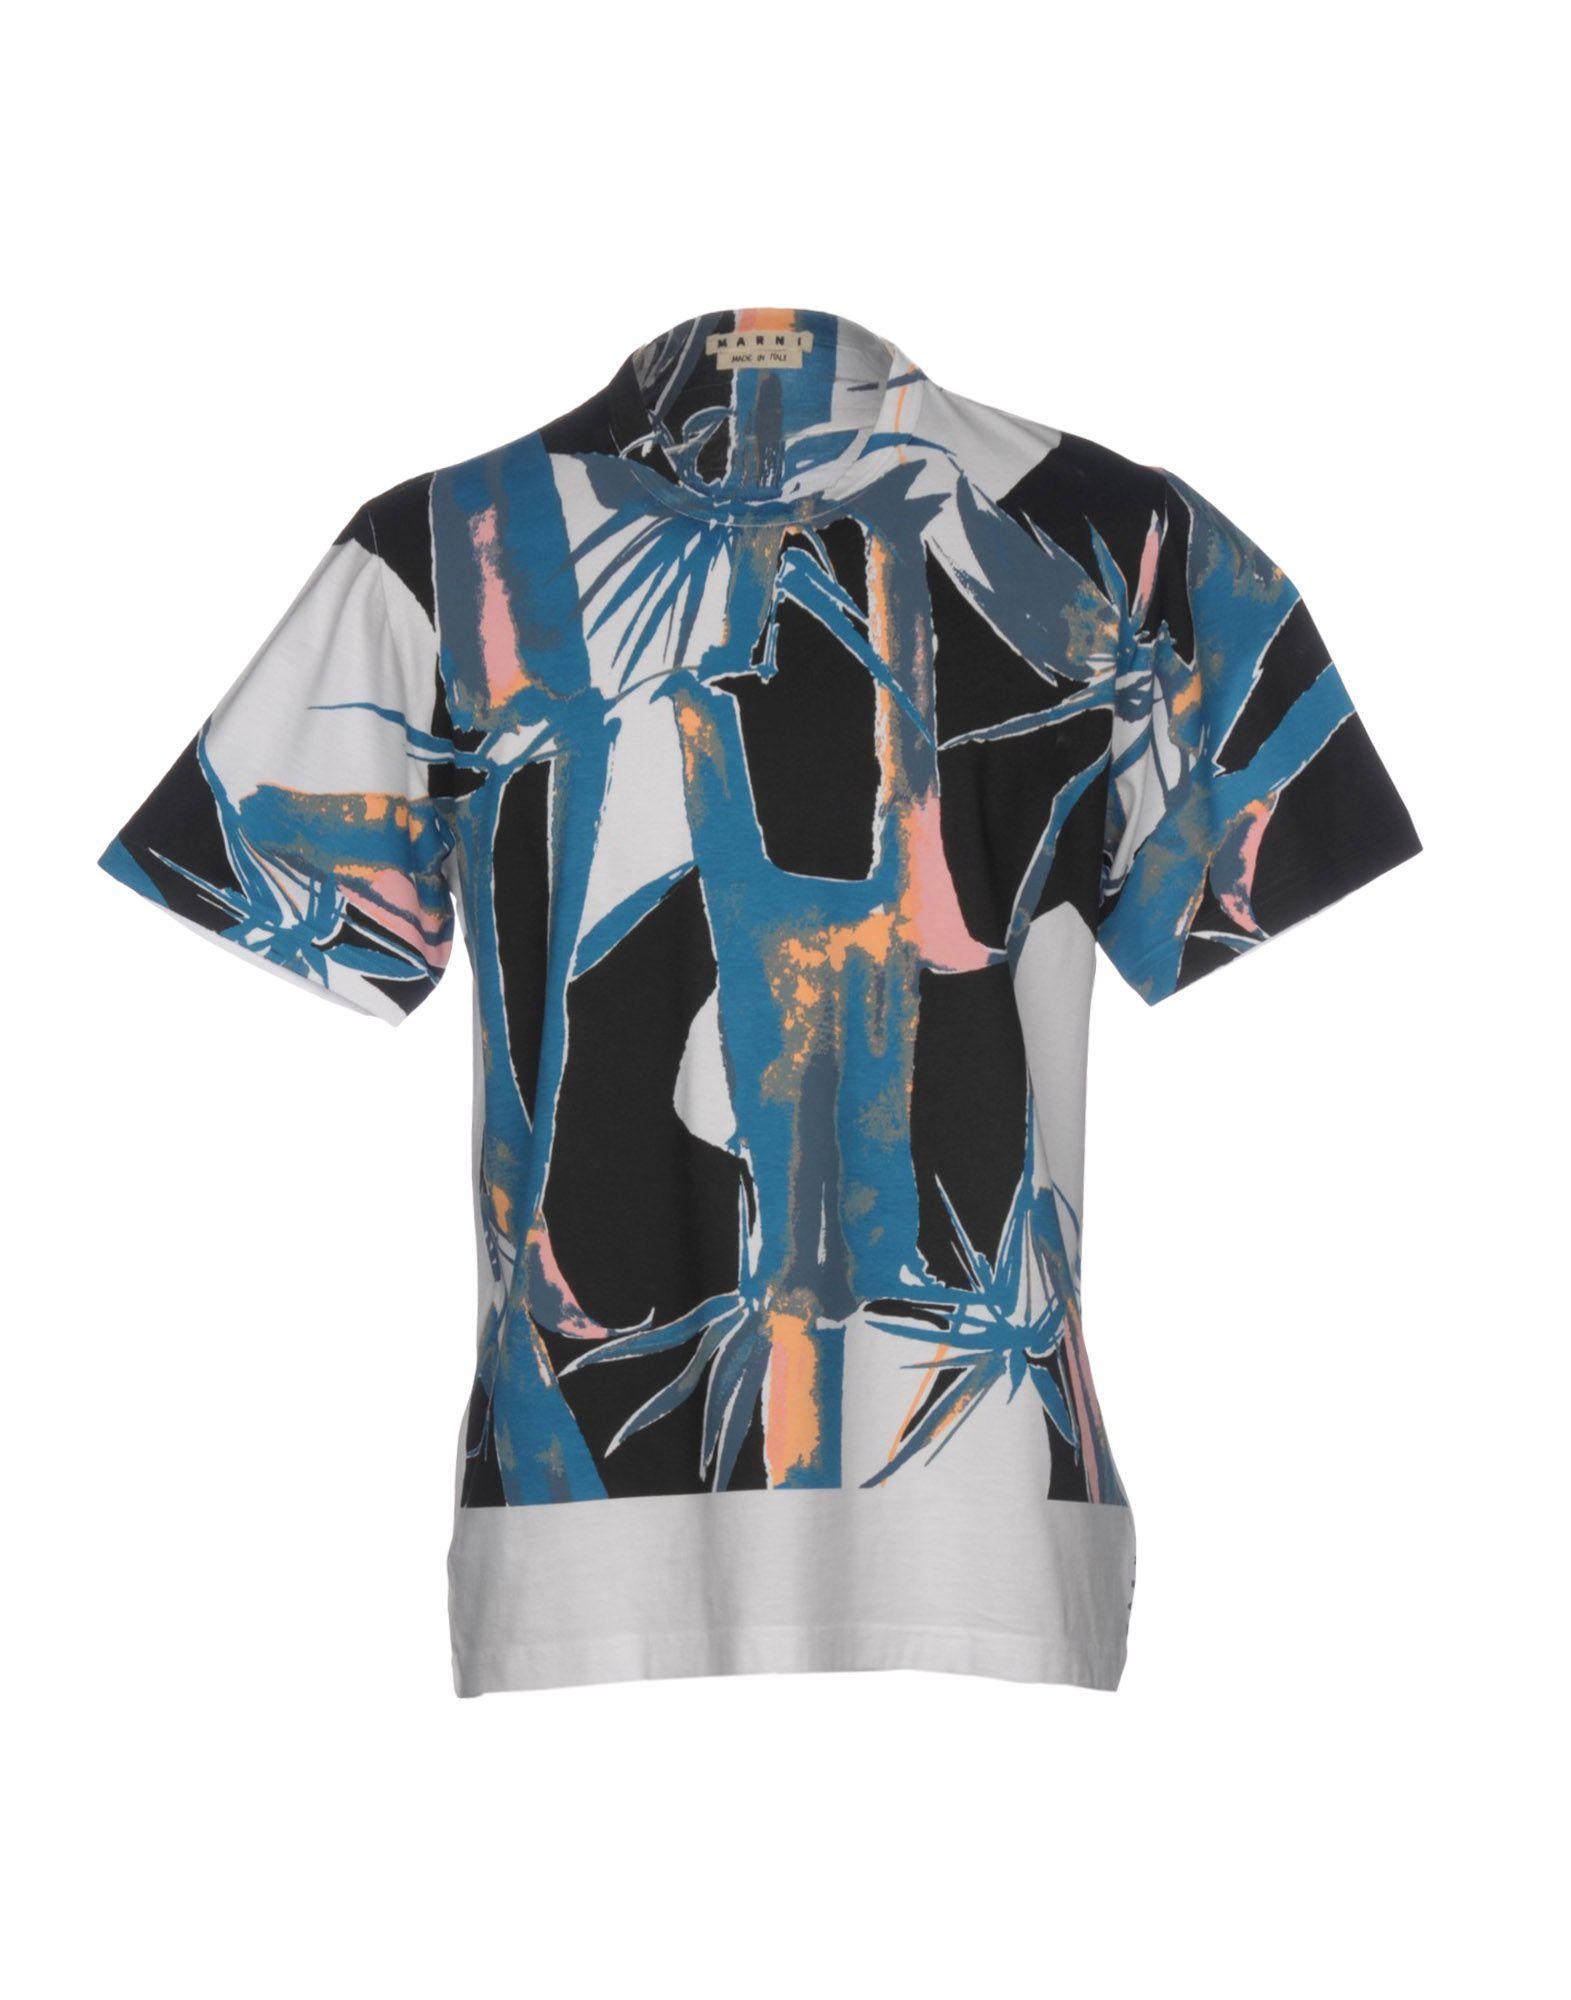 A buon mercato A A mercato buon mercato T-Shirt Marni Uomo - 12202441XP 4ba03a